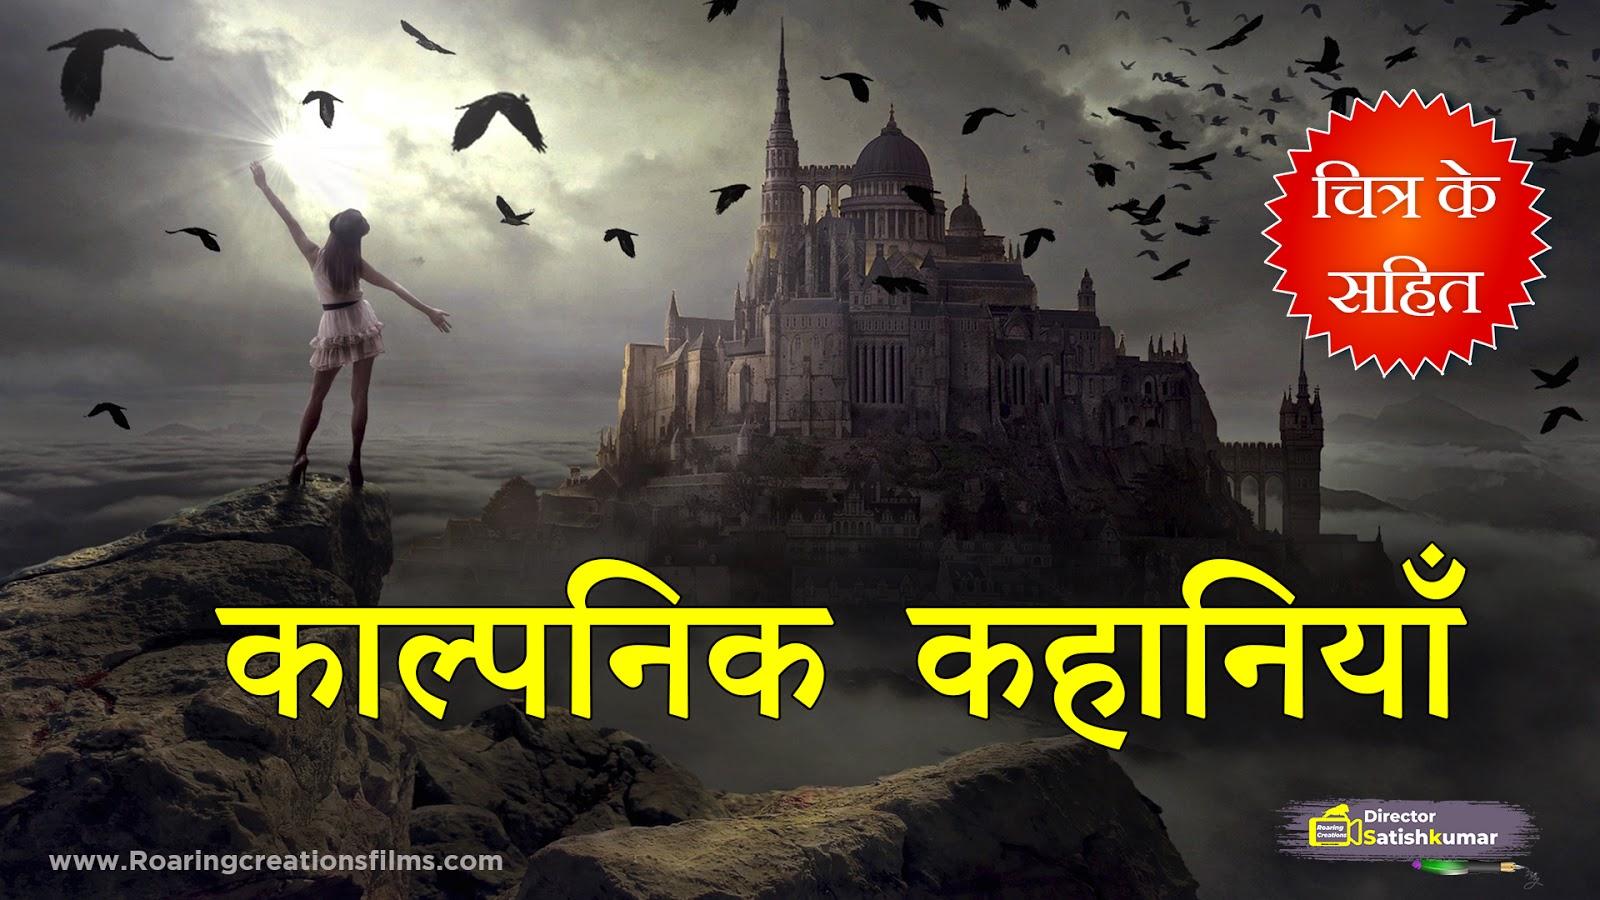 काल्पनिक कहानियाँ - Fairy Tales in Hindi - Fairy Stories in Hindi